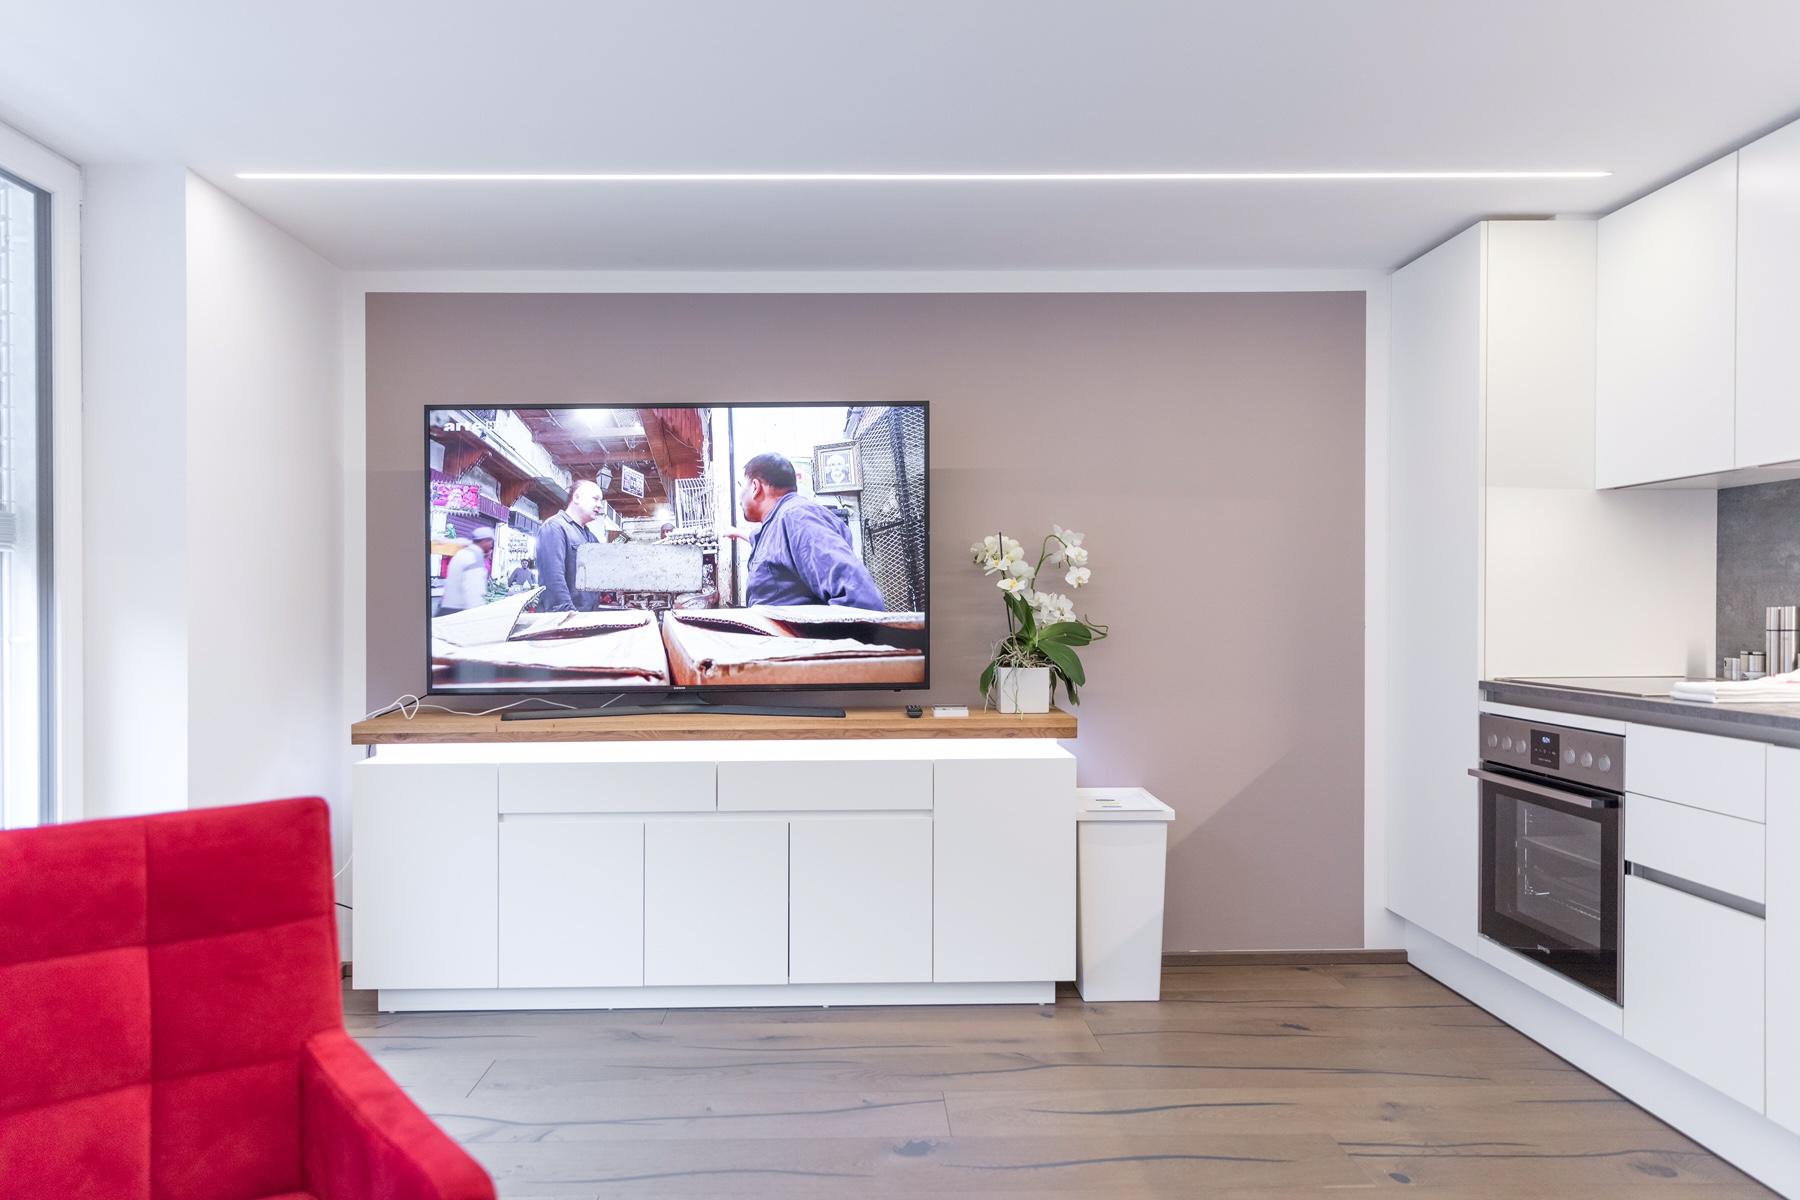 Riesiger TV